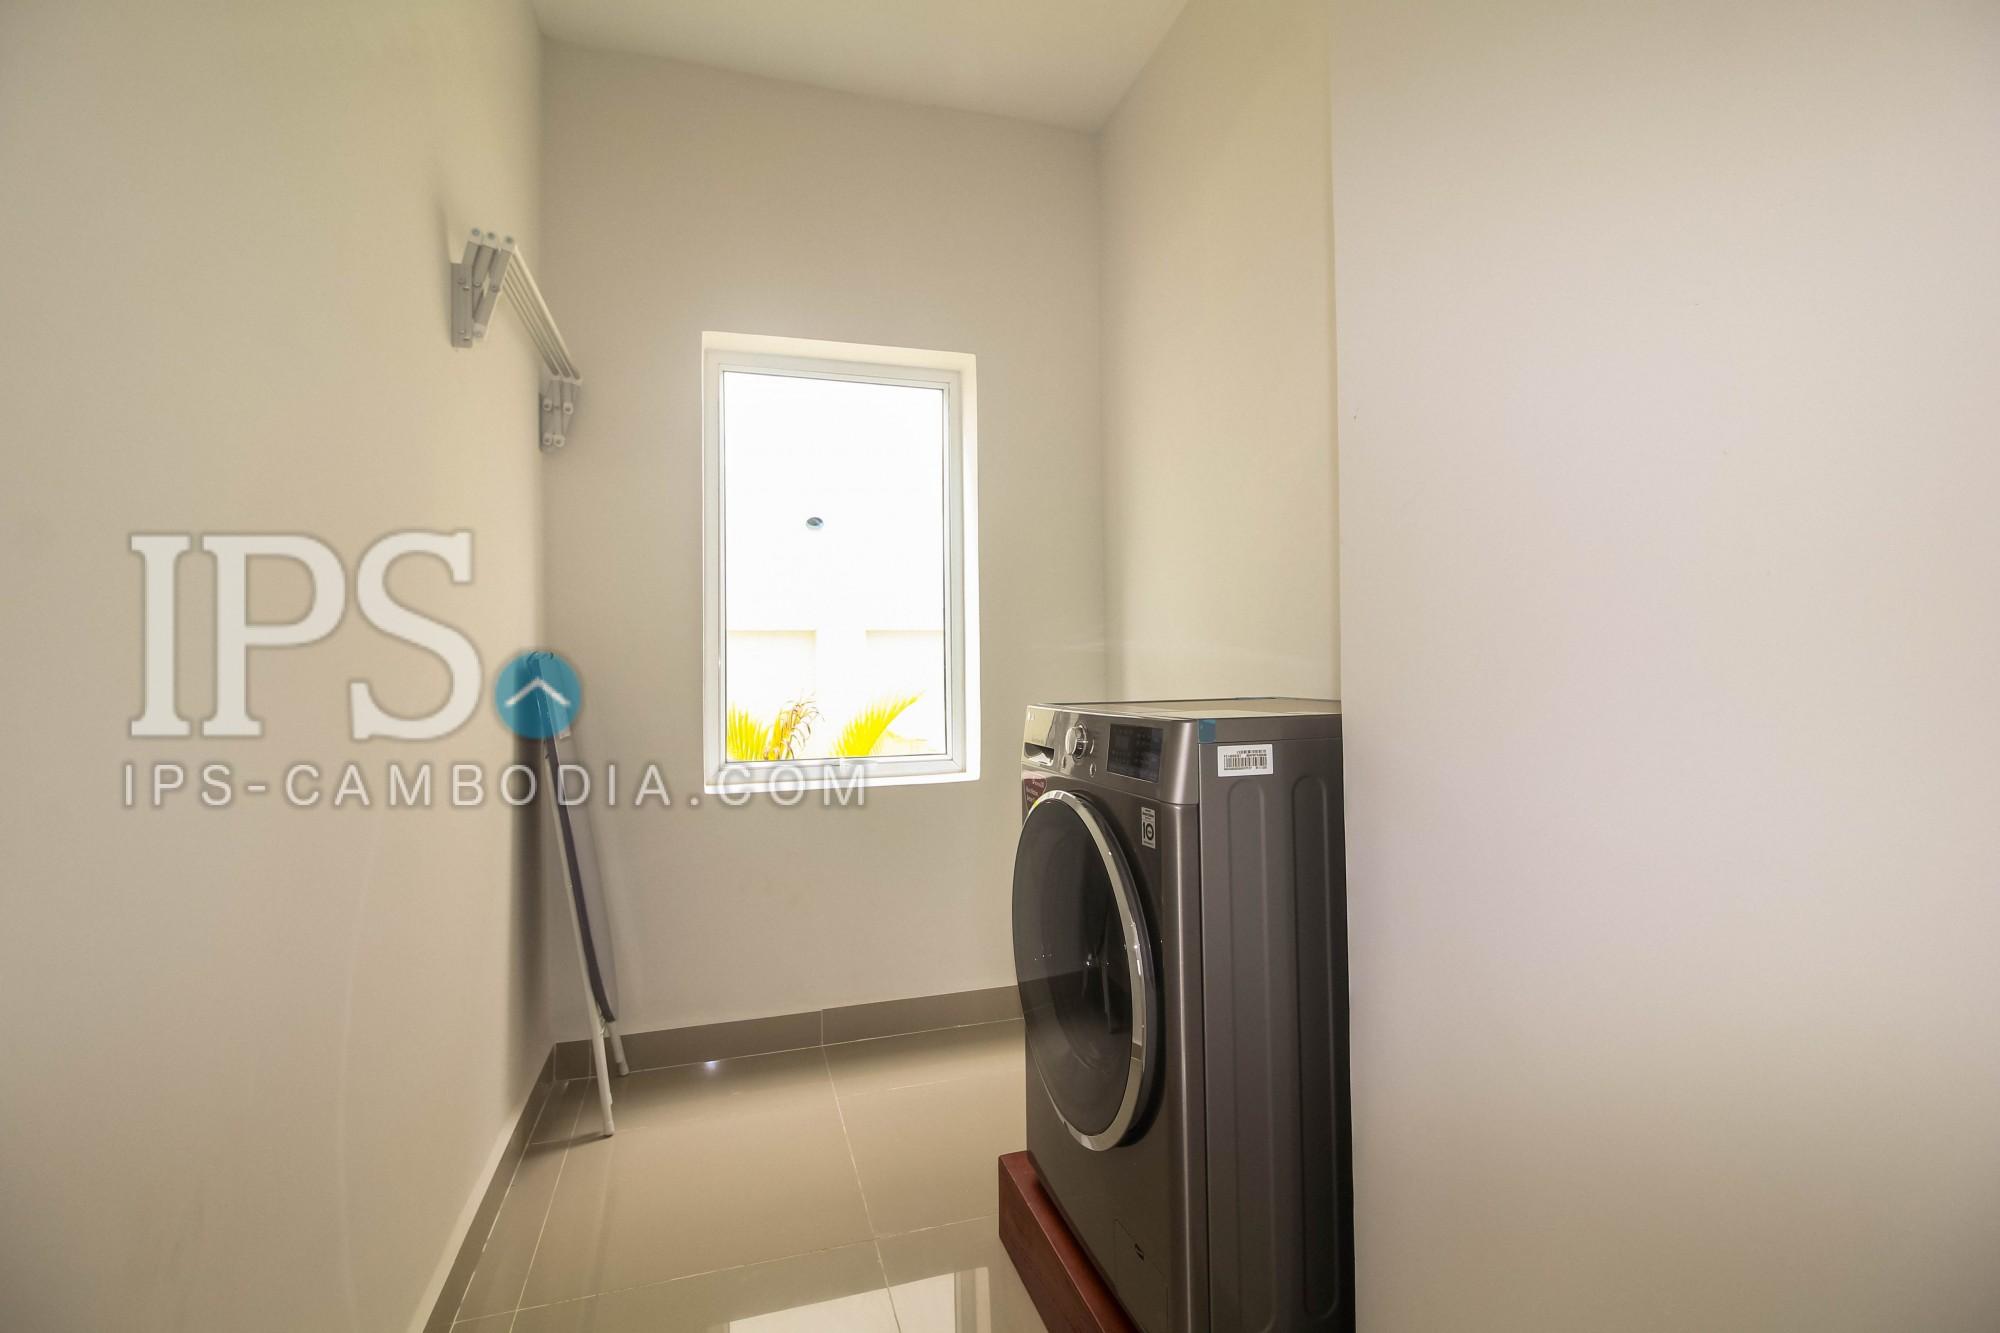 3 Bedrooms Villa  For Rent - Sra Ngae, Siem Reap